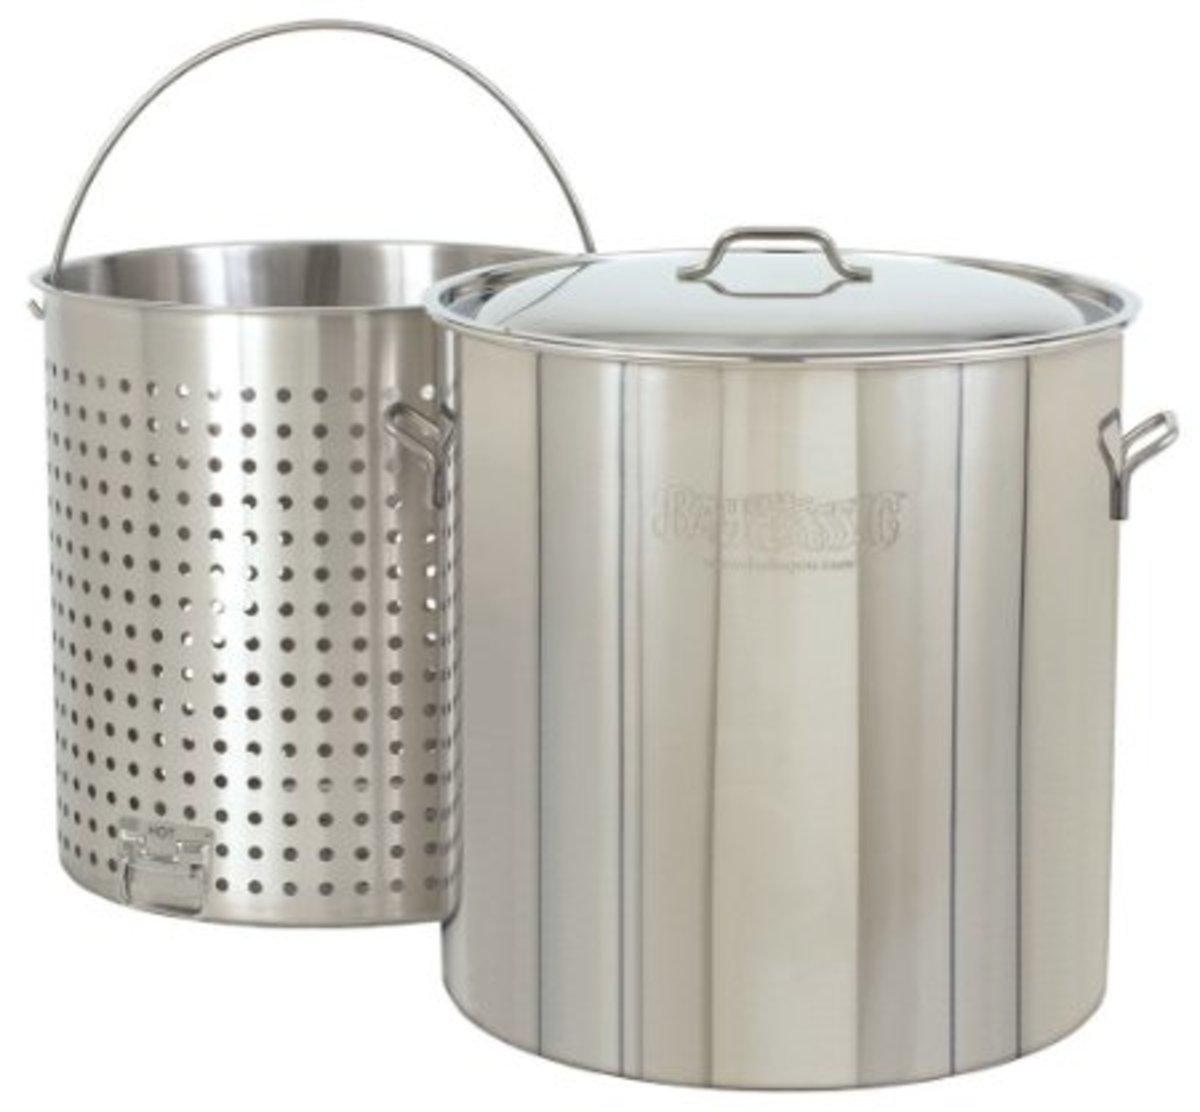 Stainless Steel Lobster/Stock Pot